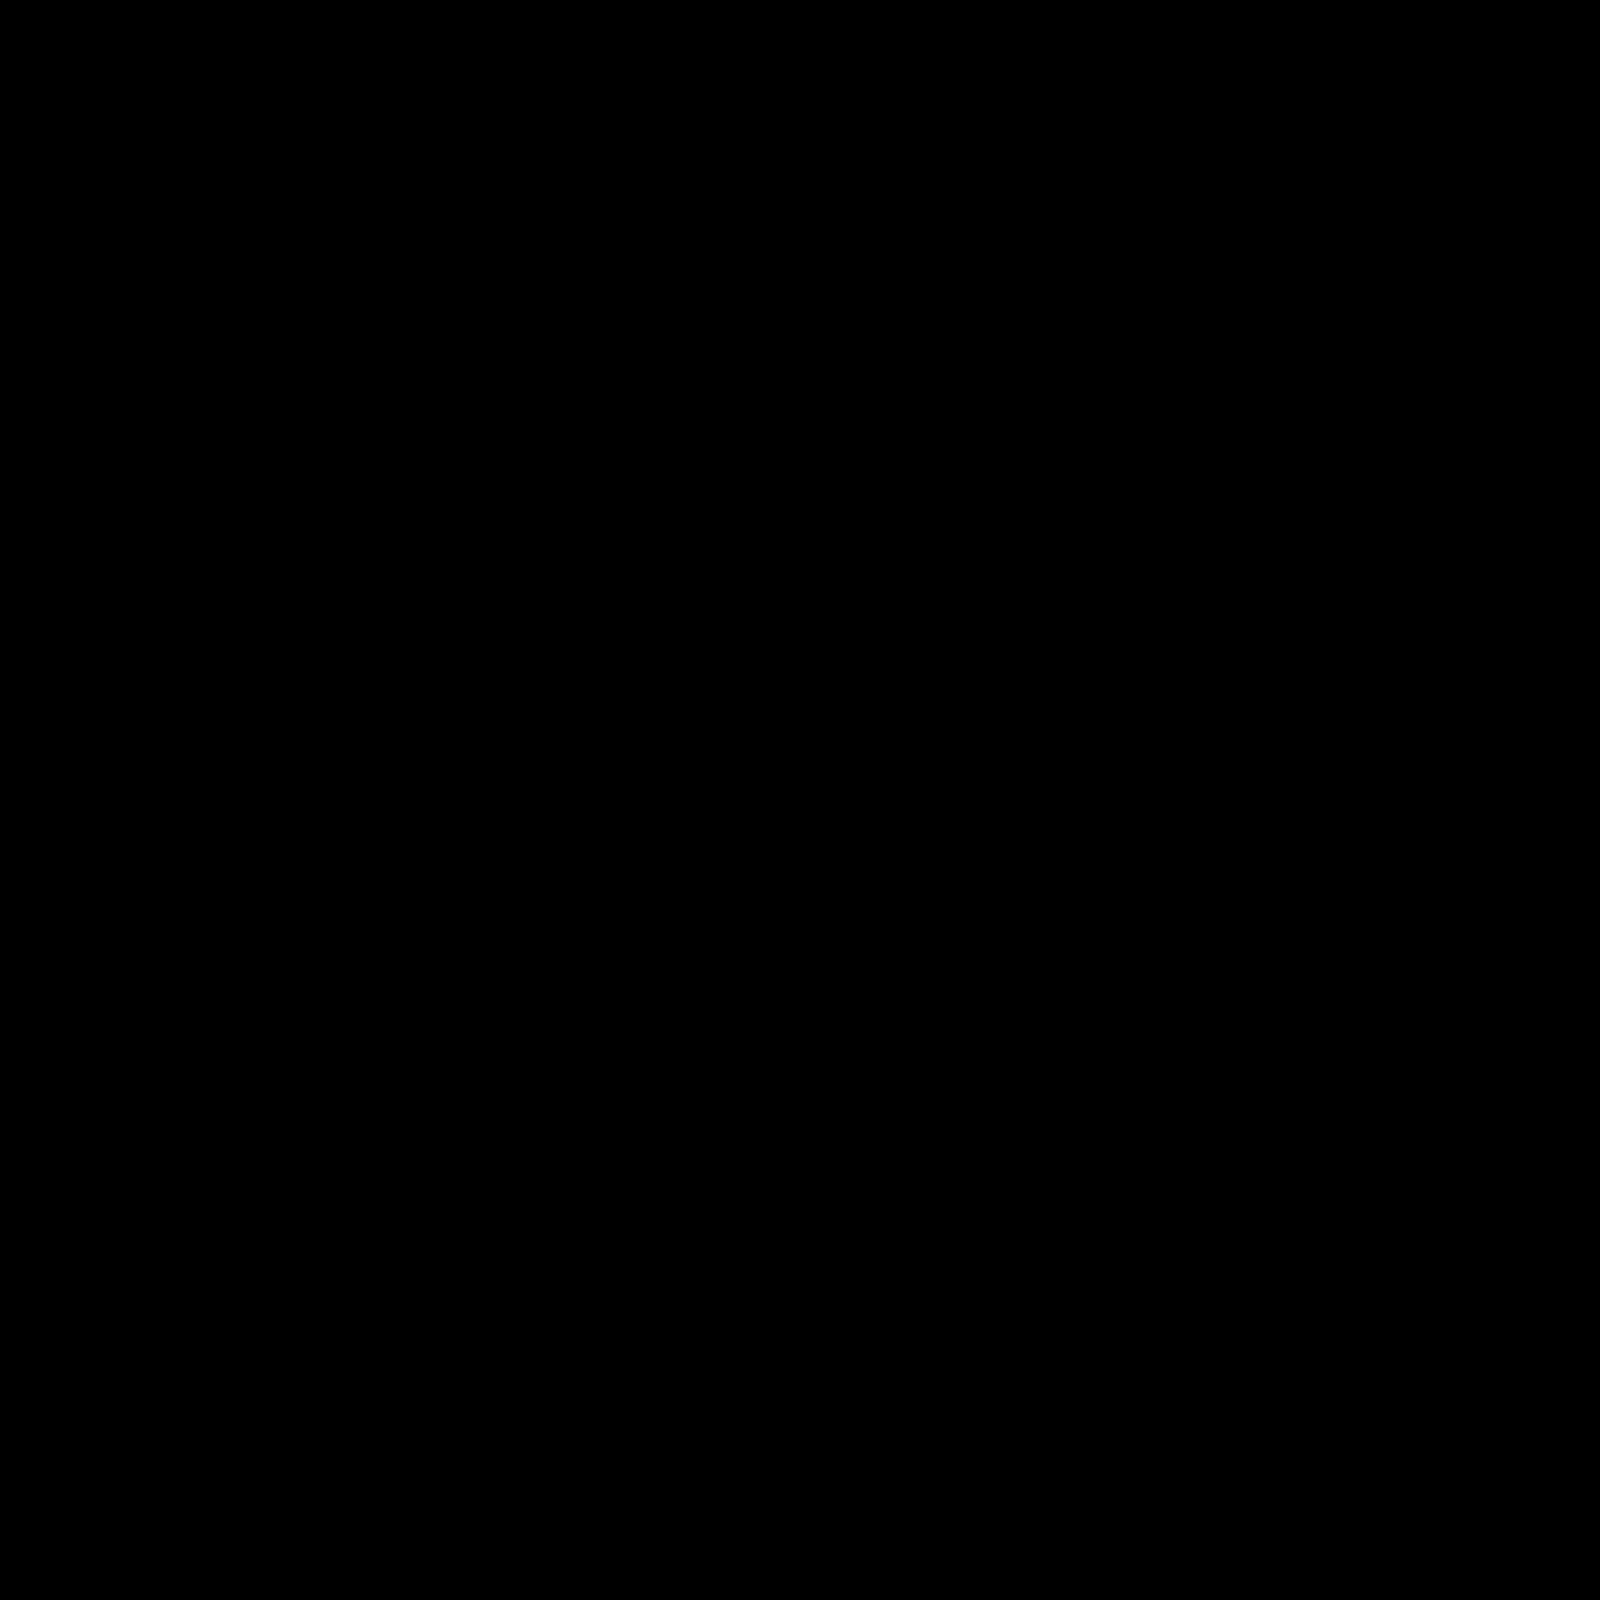 Reculer de 10 icon